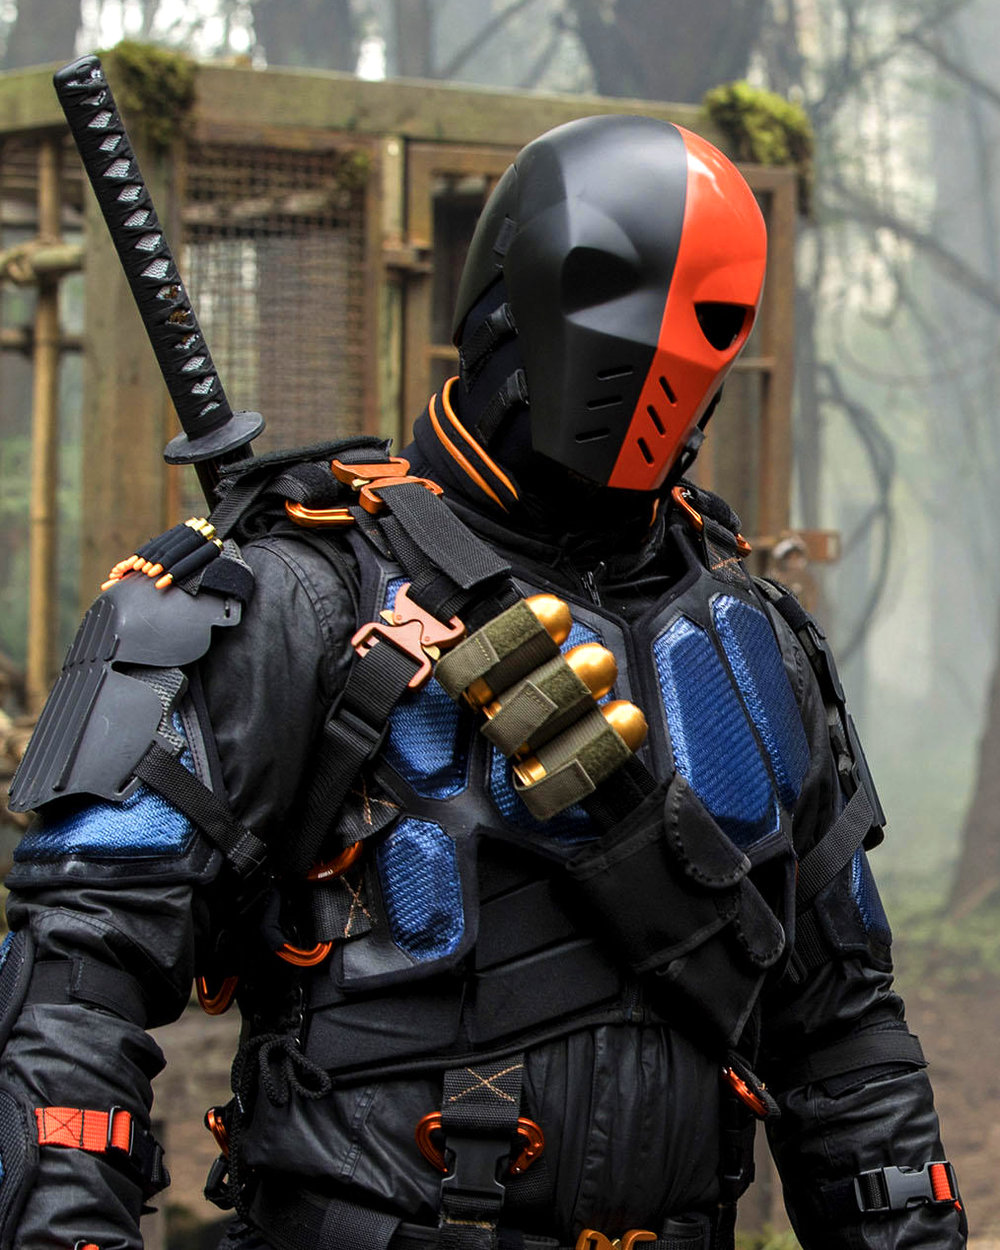 Deathstroke Helmet - Costume by Aaron Harrison